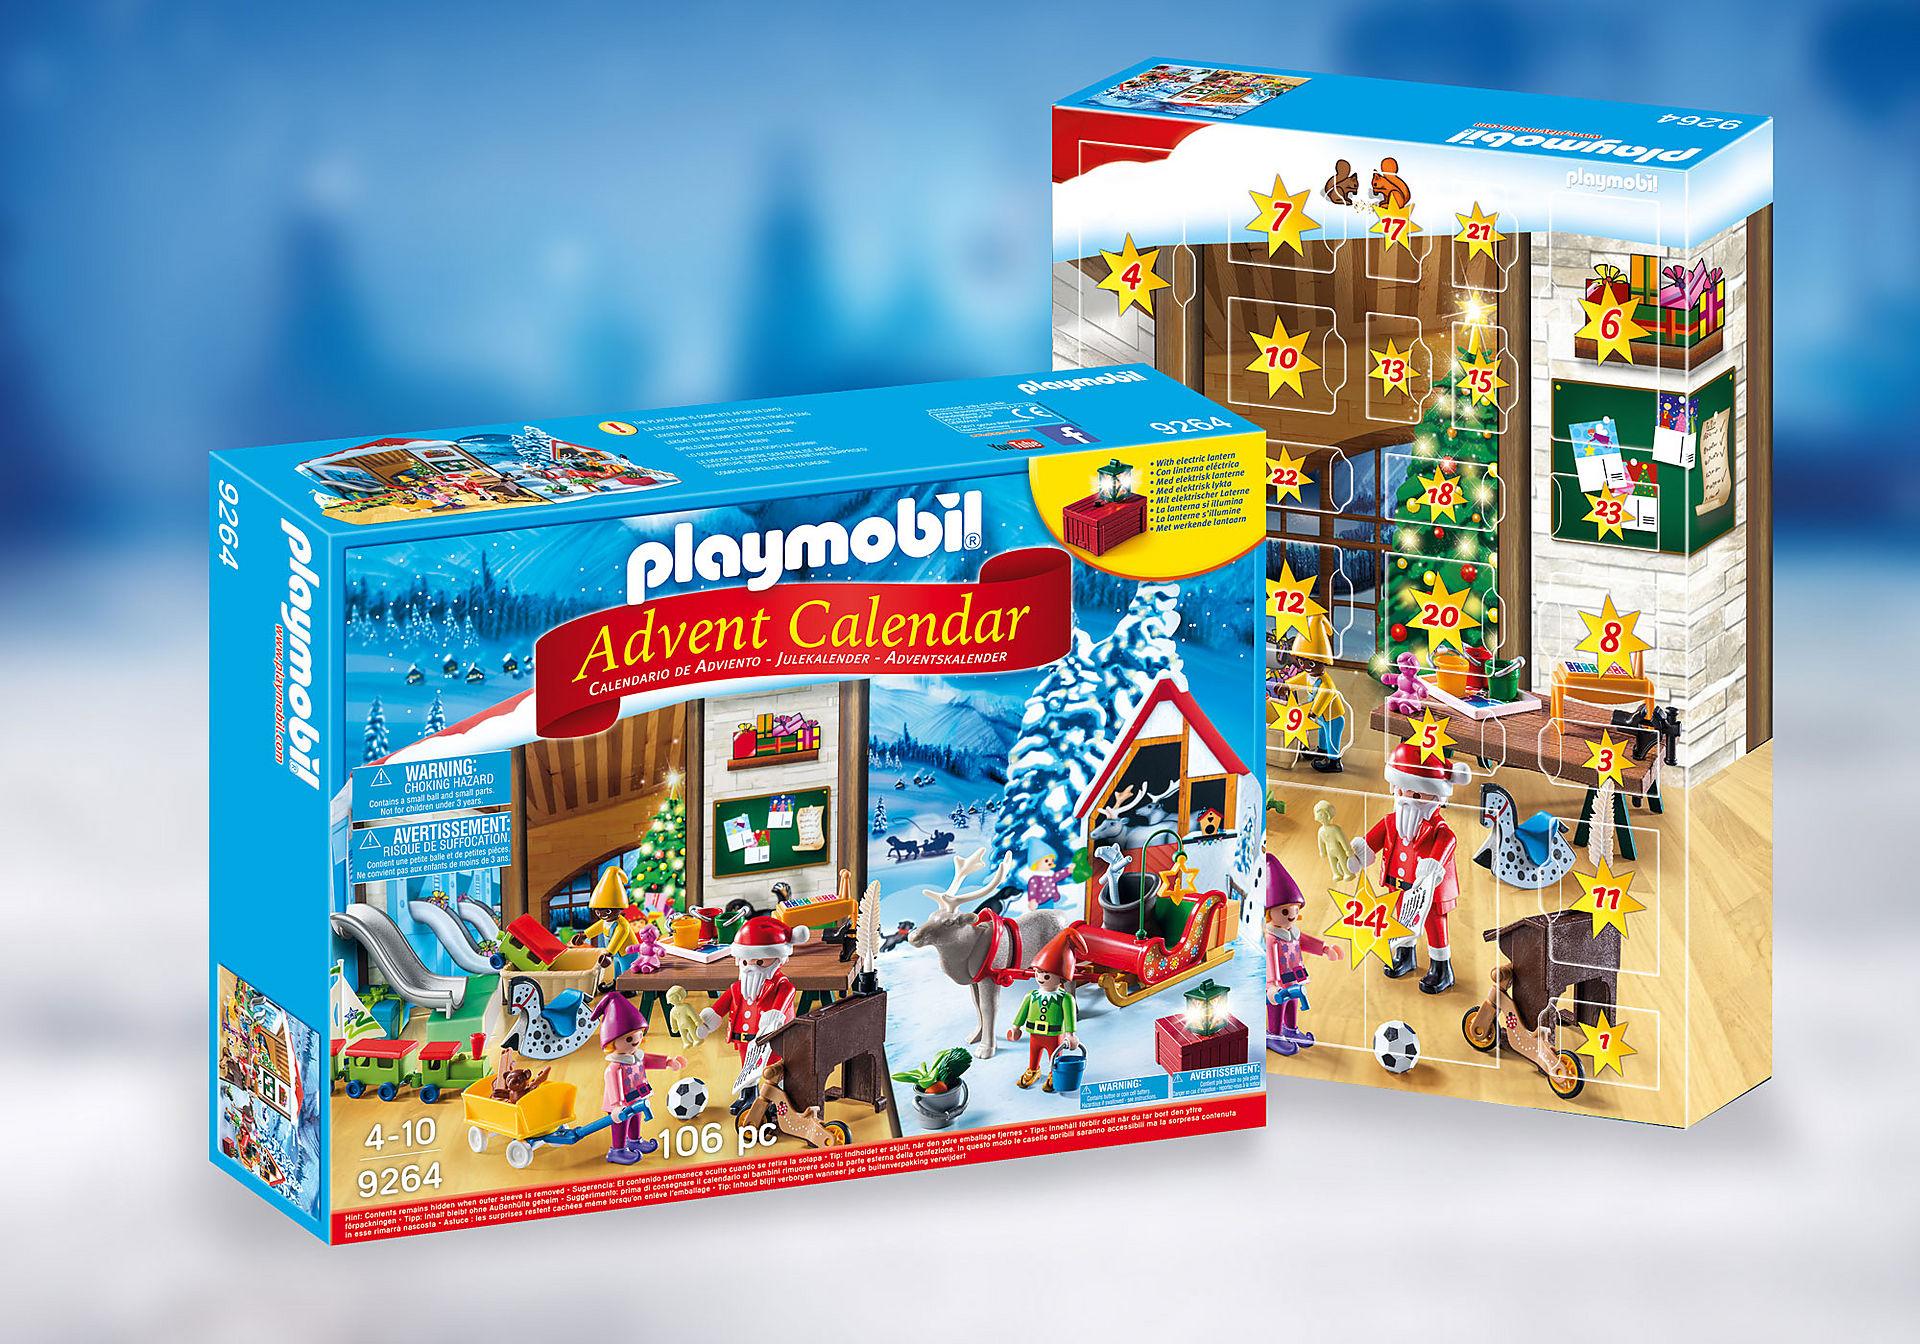 9264 Advent Calendar - Santa's Workshop zoom image1